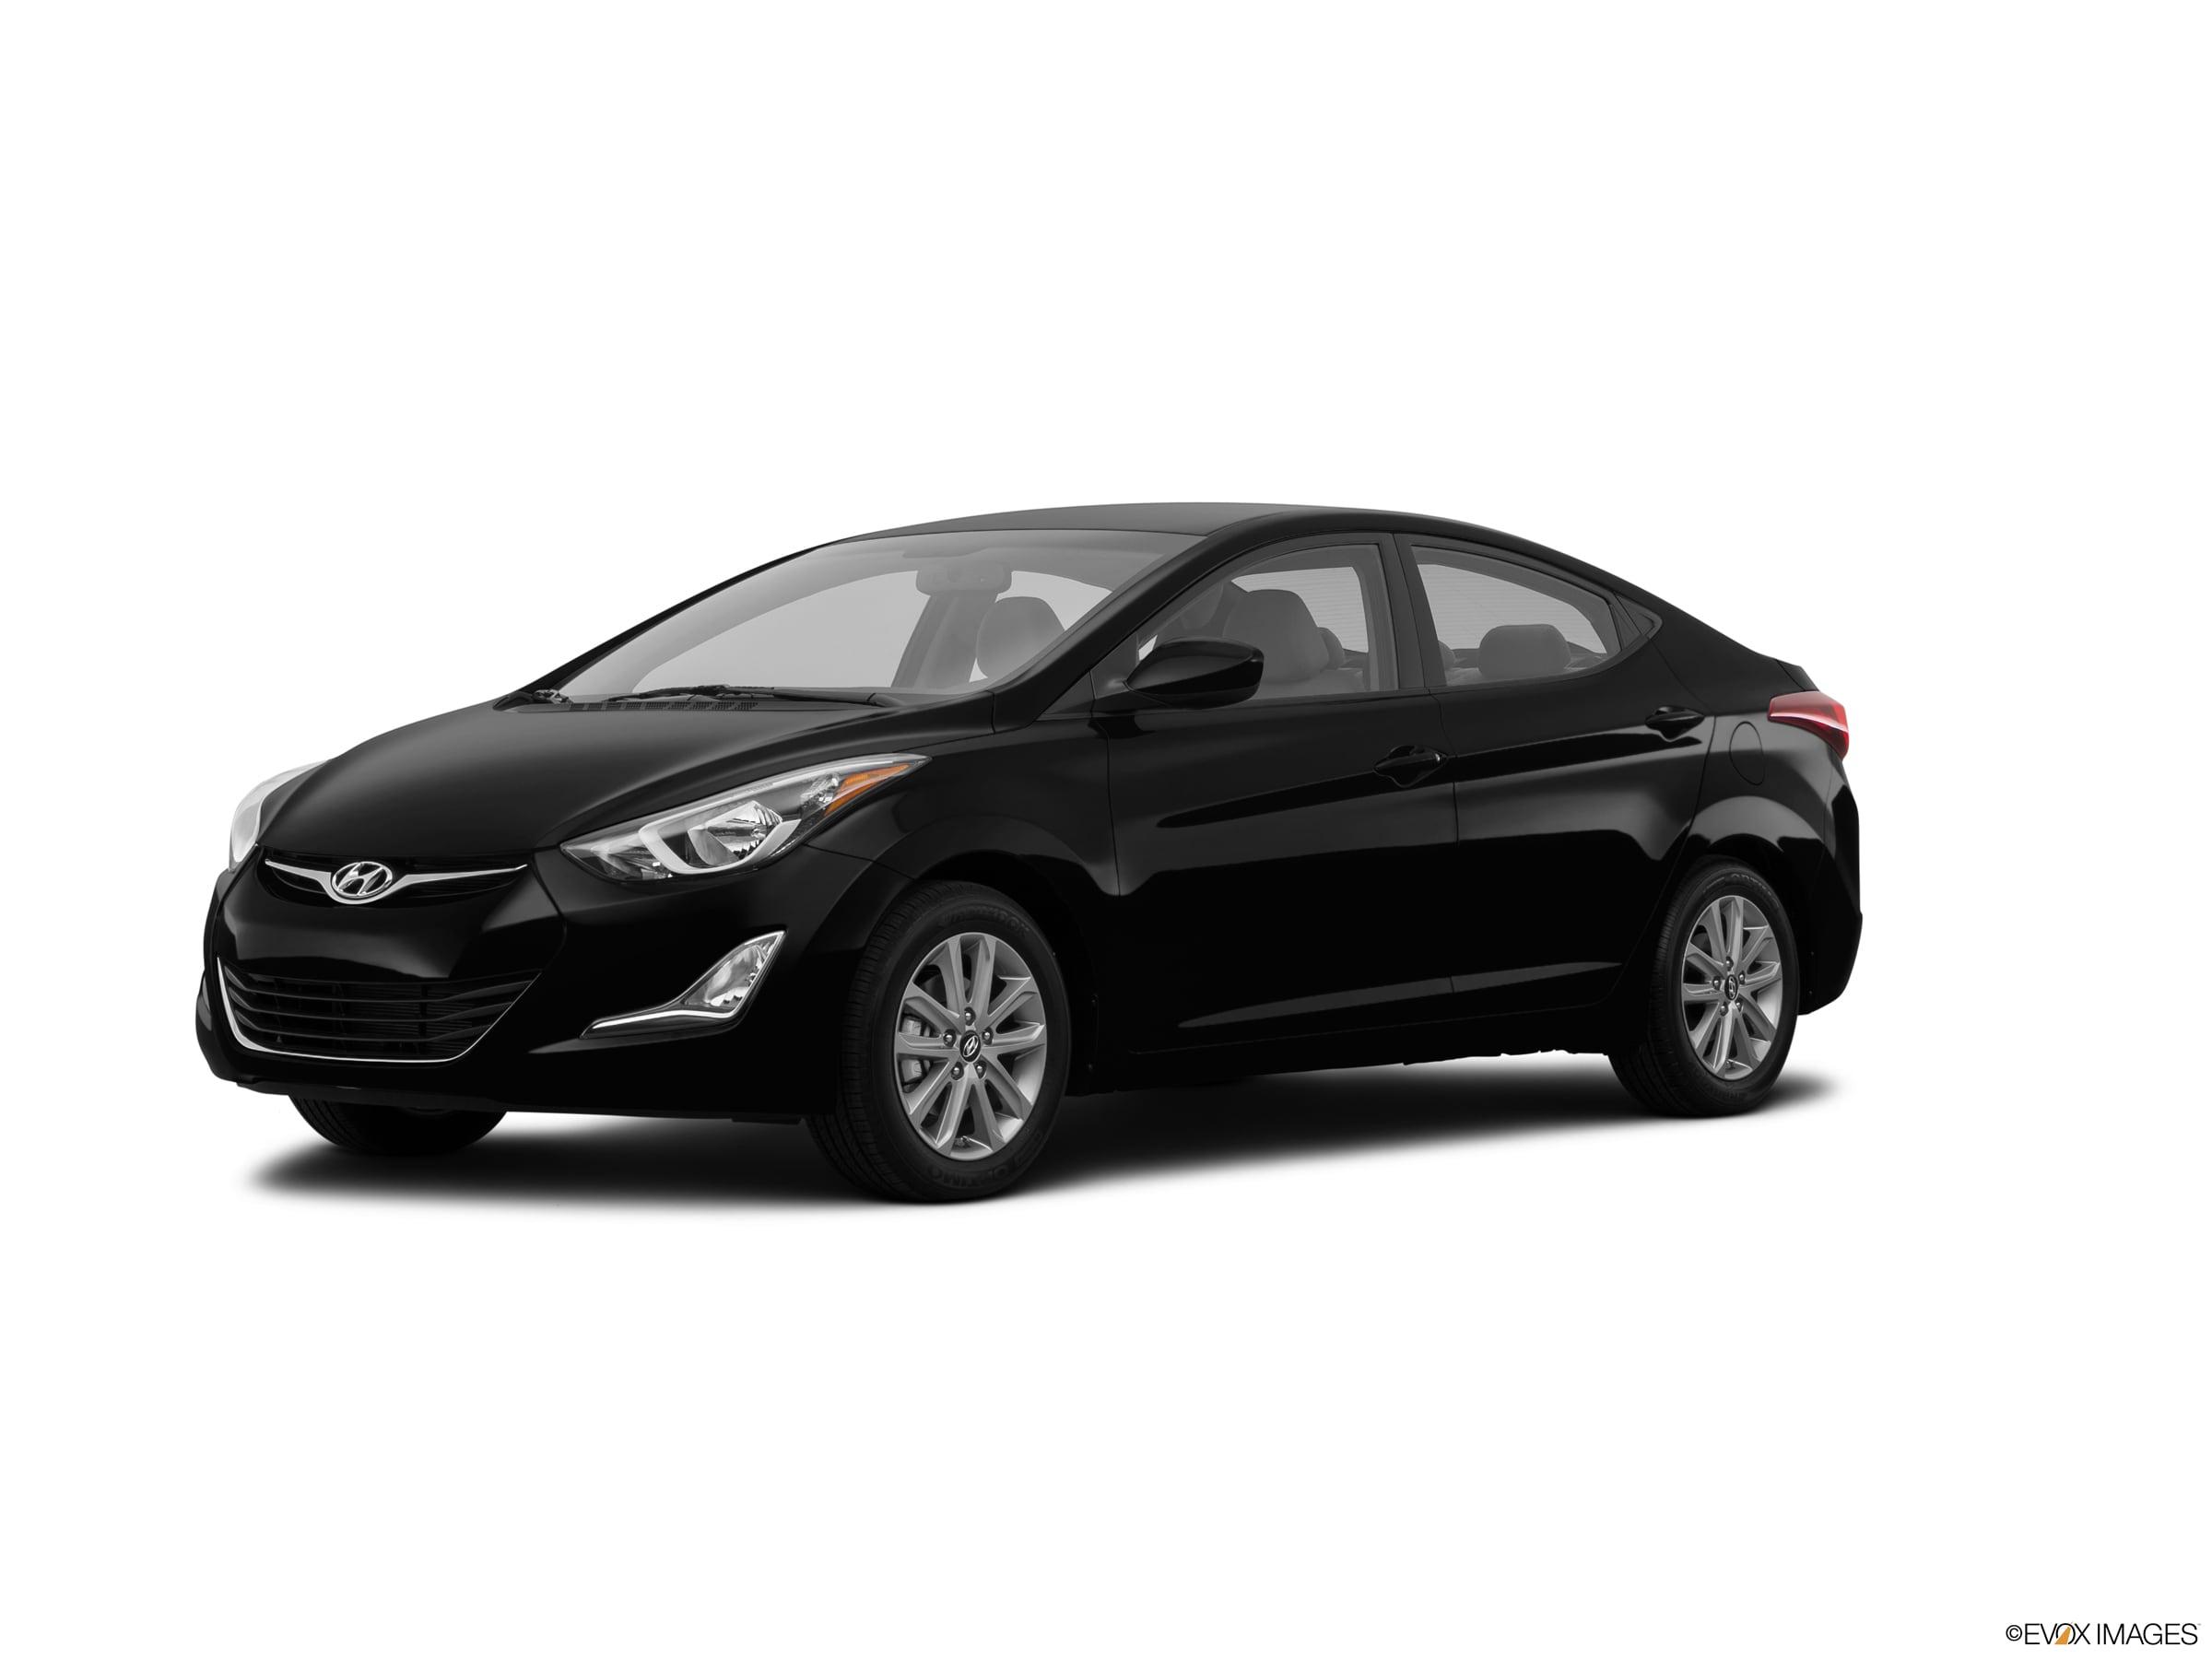 used 2014 Hyundai Elantra car, priced at $12,998